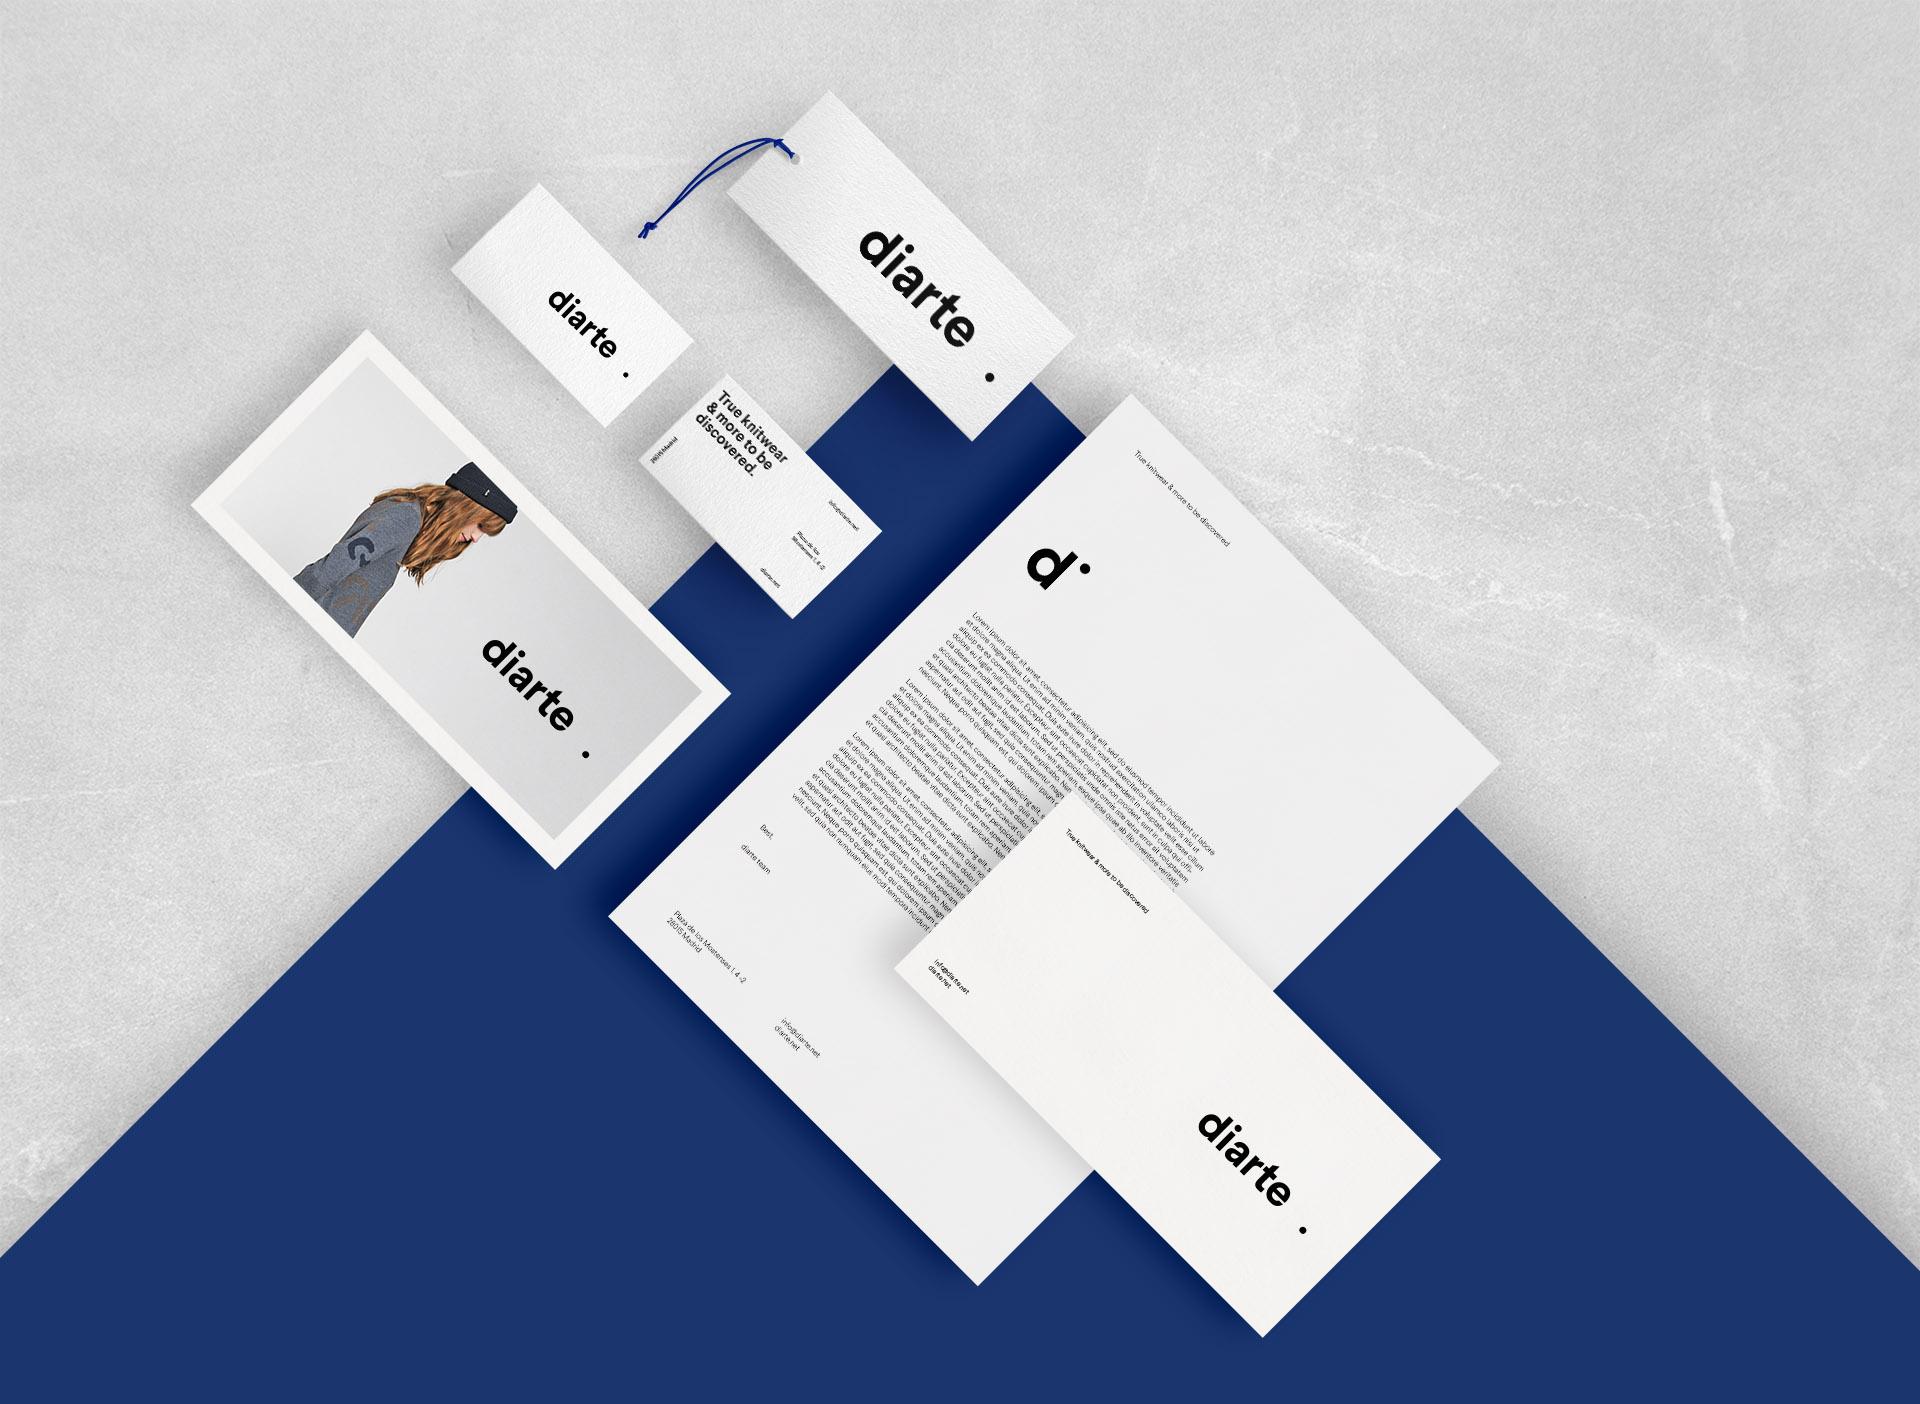 Diarte - Rebeka Arce  Art direction and graphic design studio